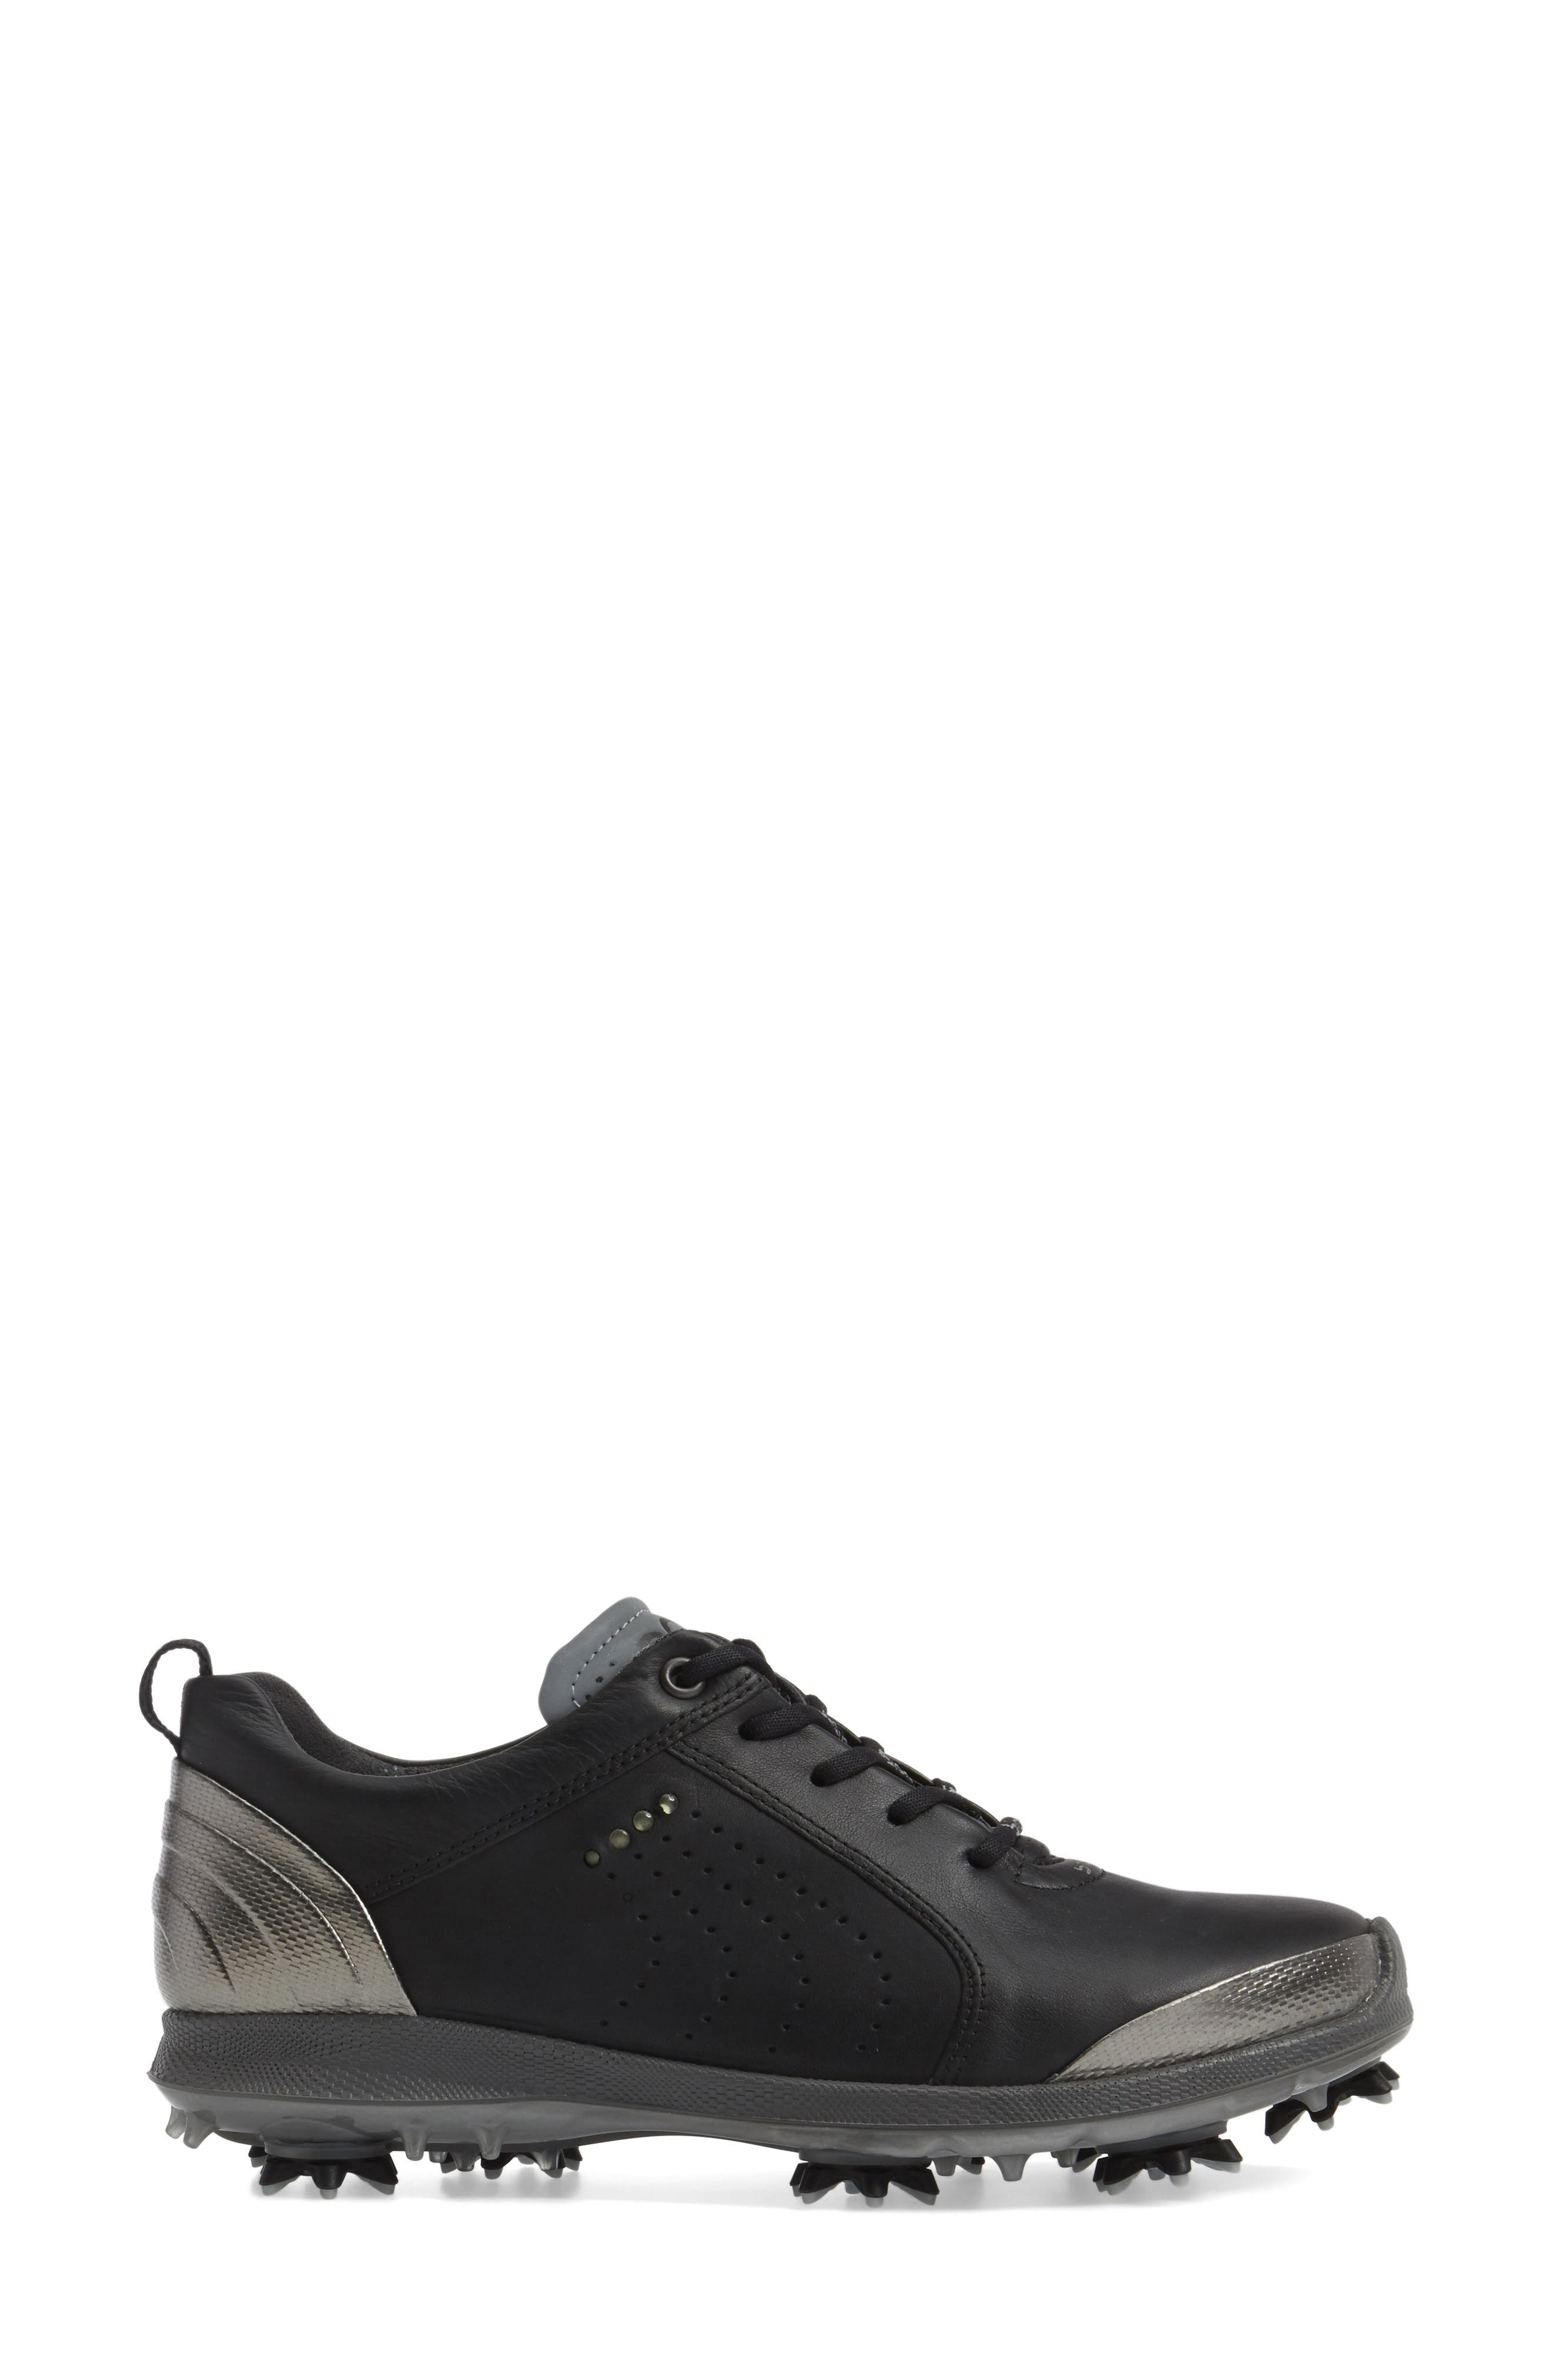 BIOM 2 Waterproof Golf Shoe,                             Alternate thumbnail 3, color,                             BLACK/ BUFFED SILVER LEATHER